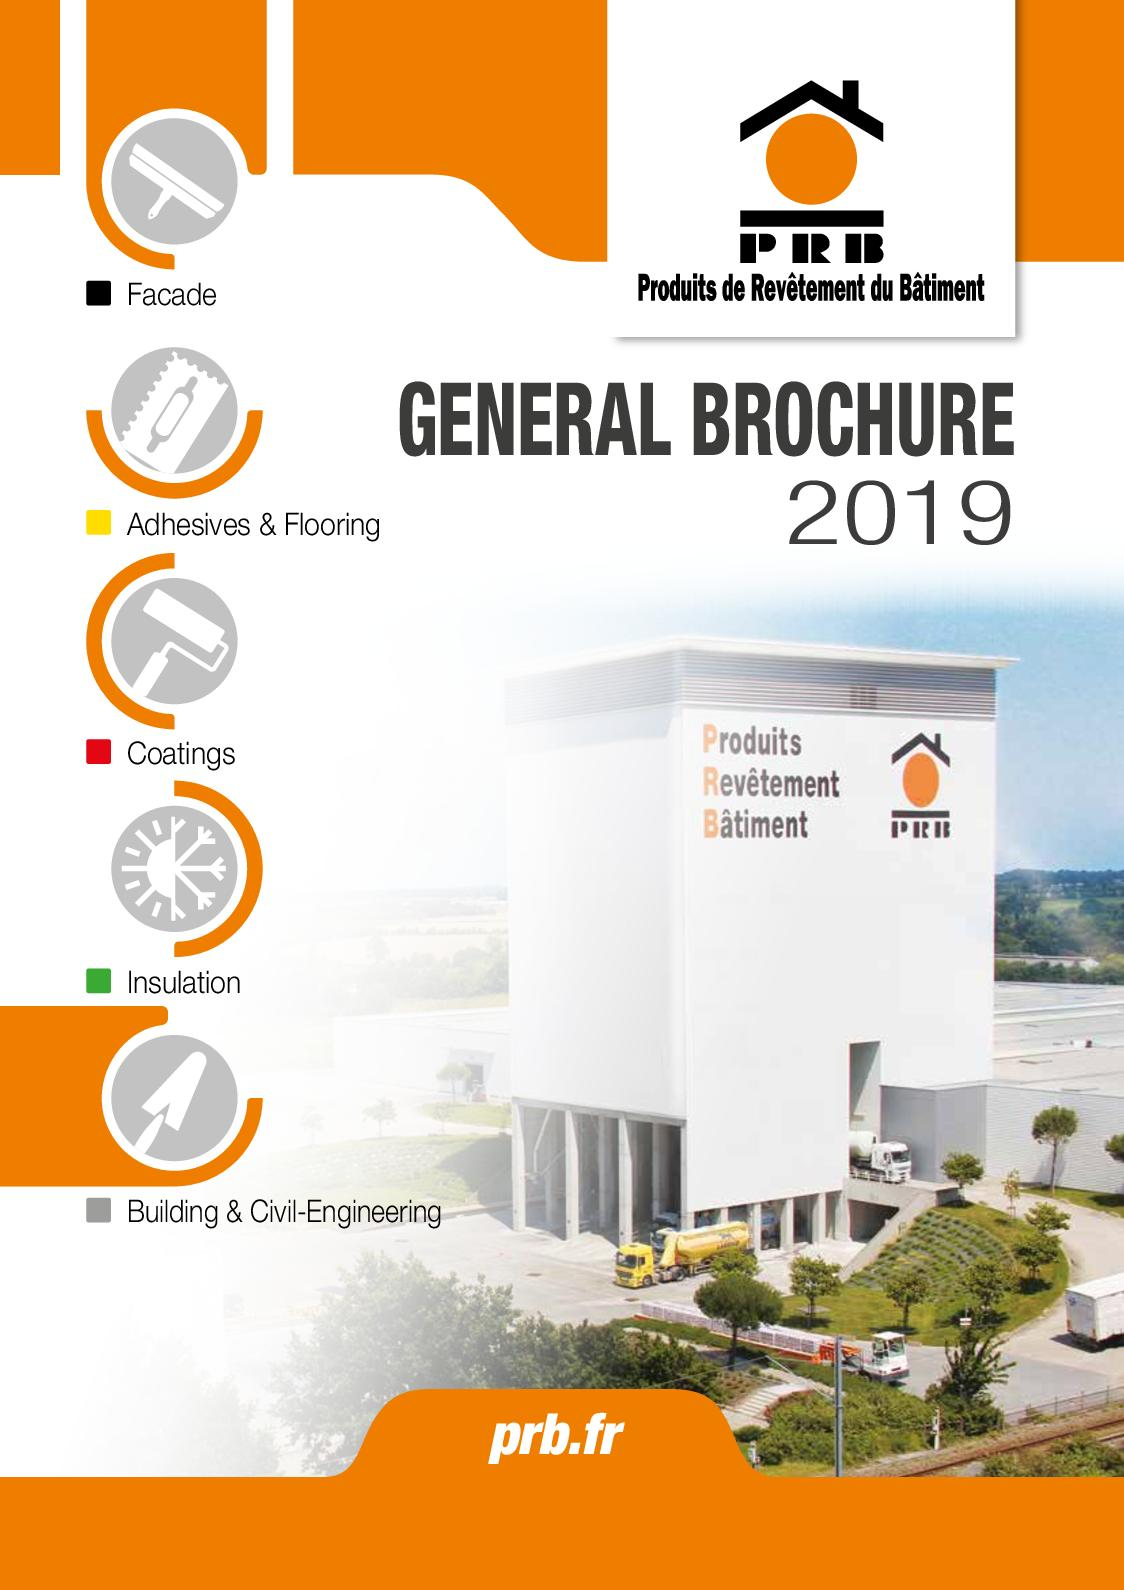 Calaméo 2019020435 Brochure Generale Prr Gb Bd